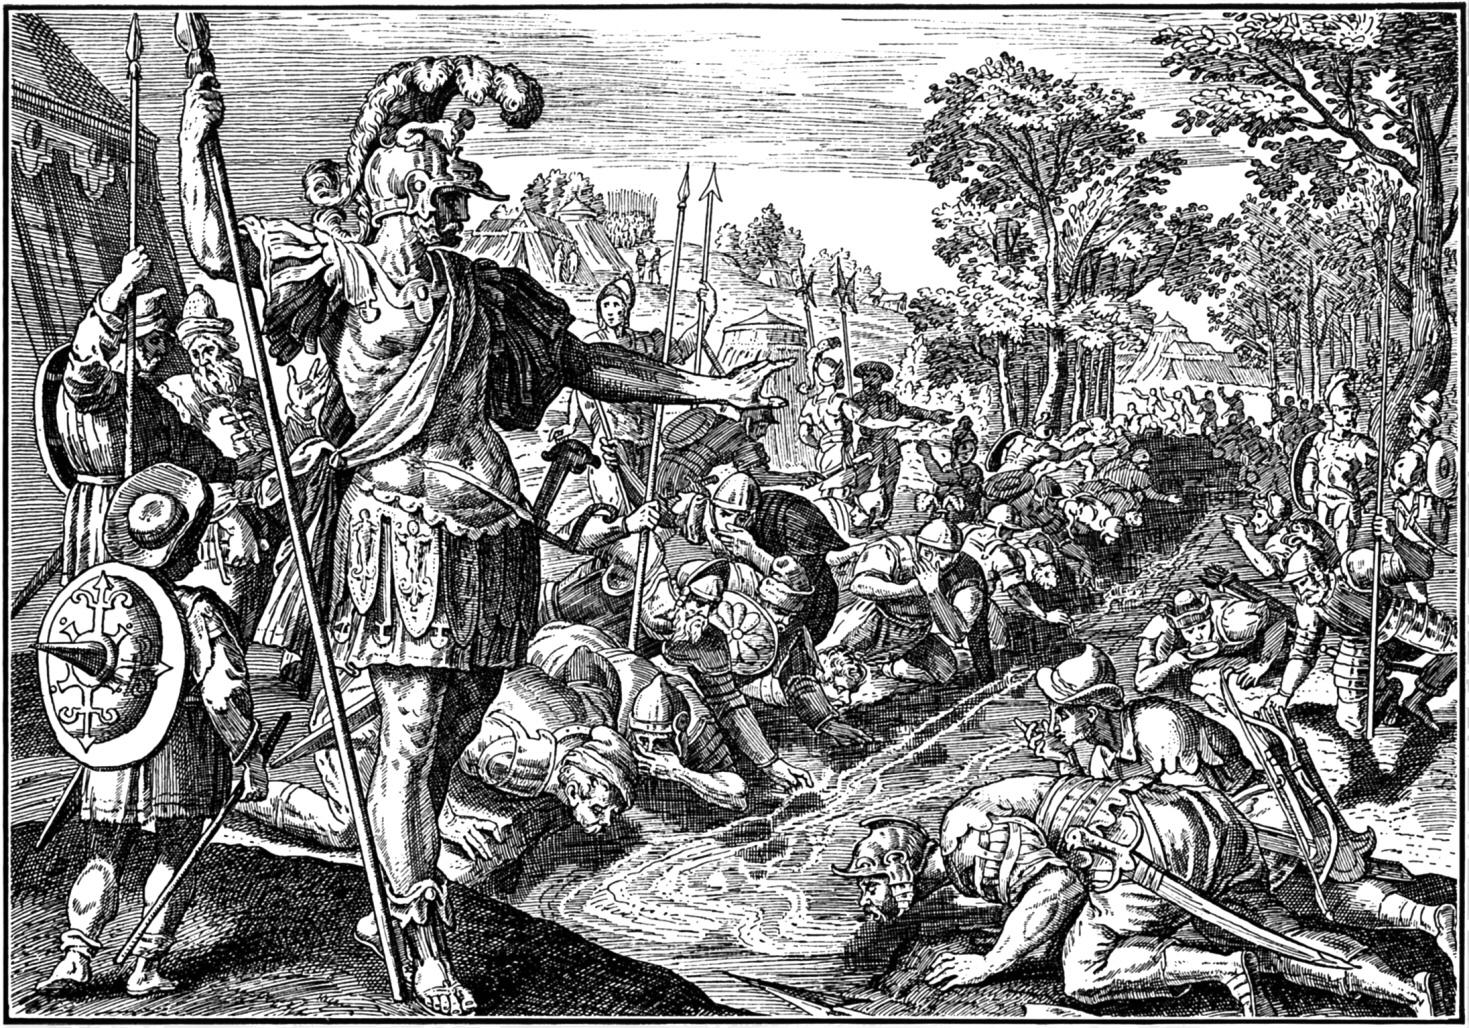 In the Bible Judges Gideon